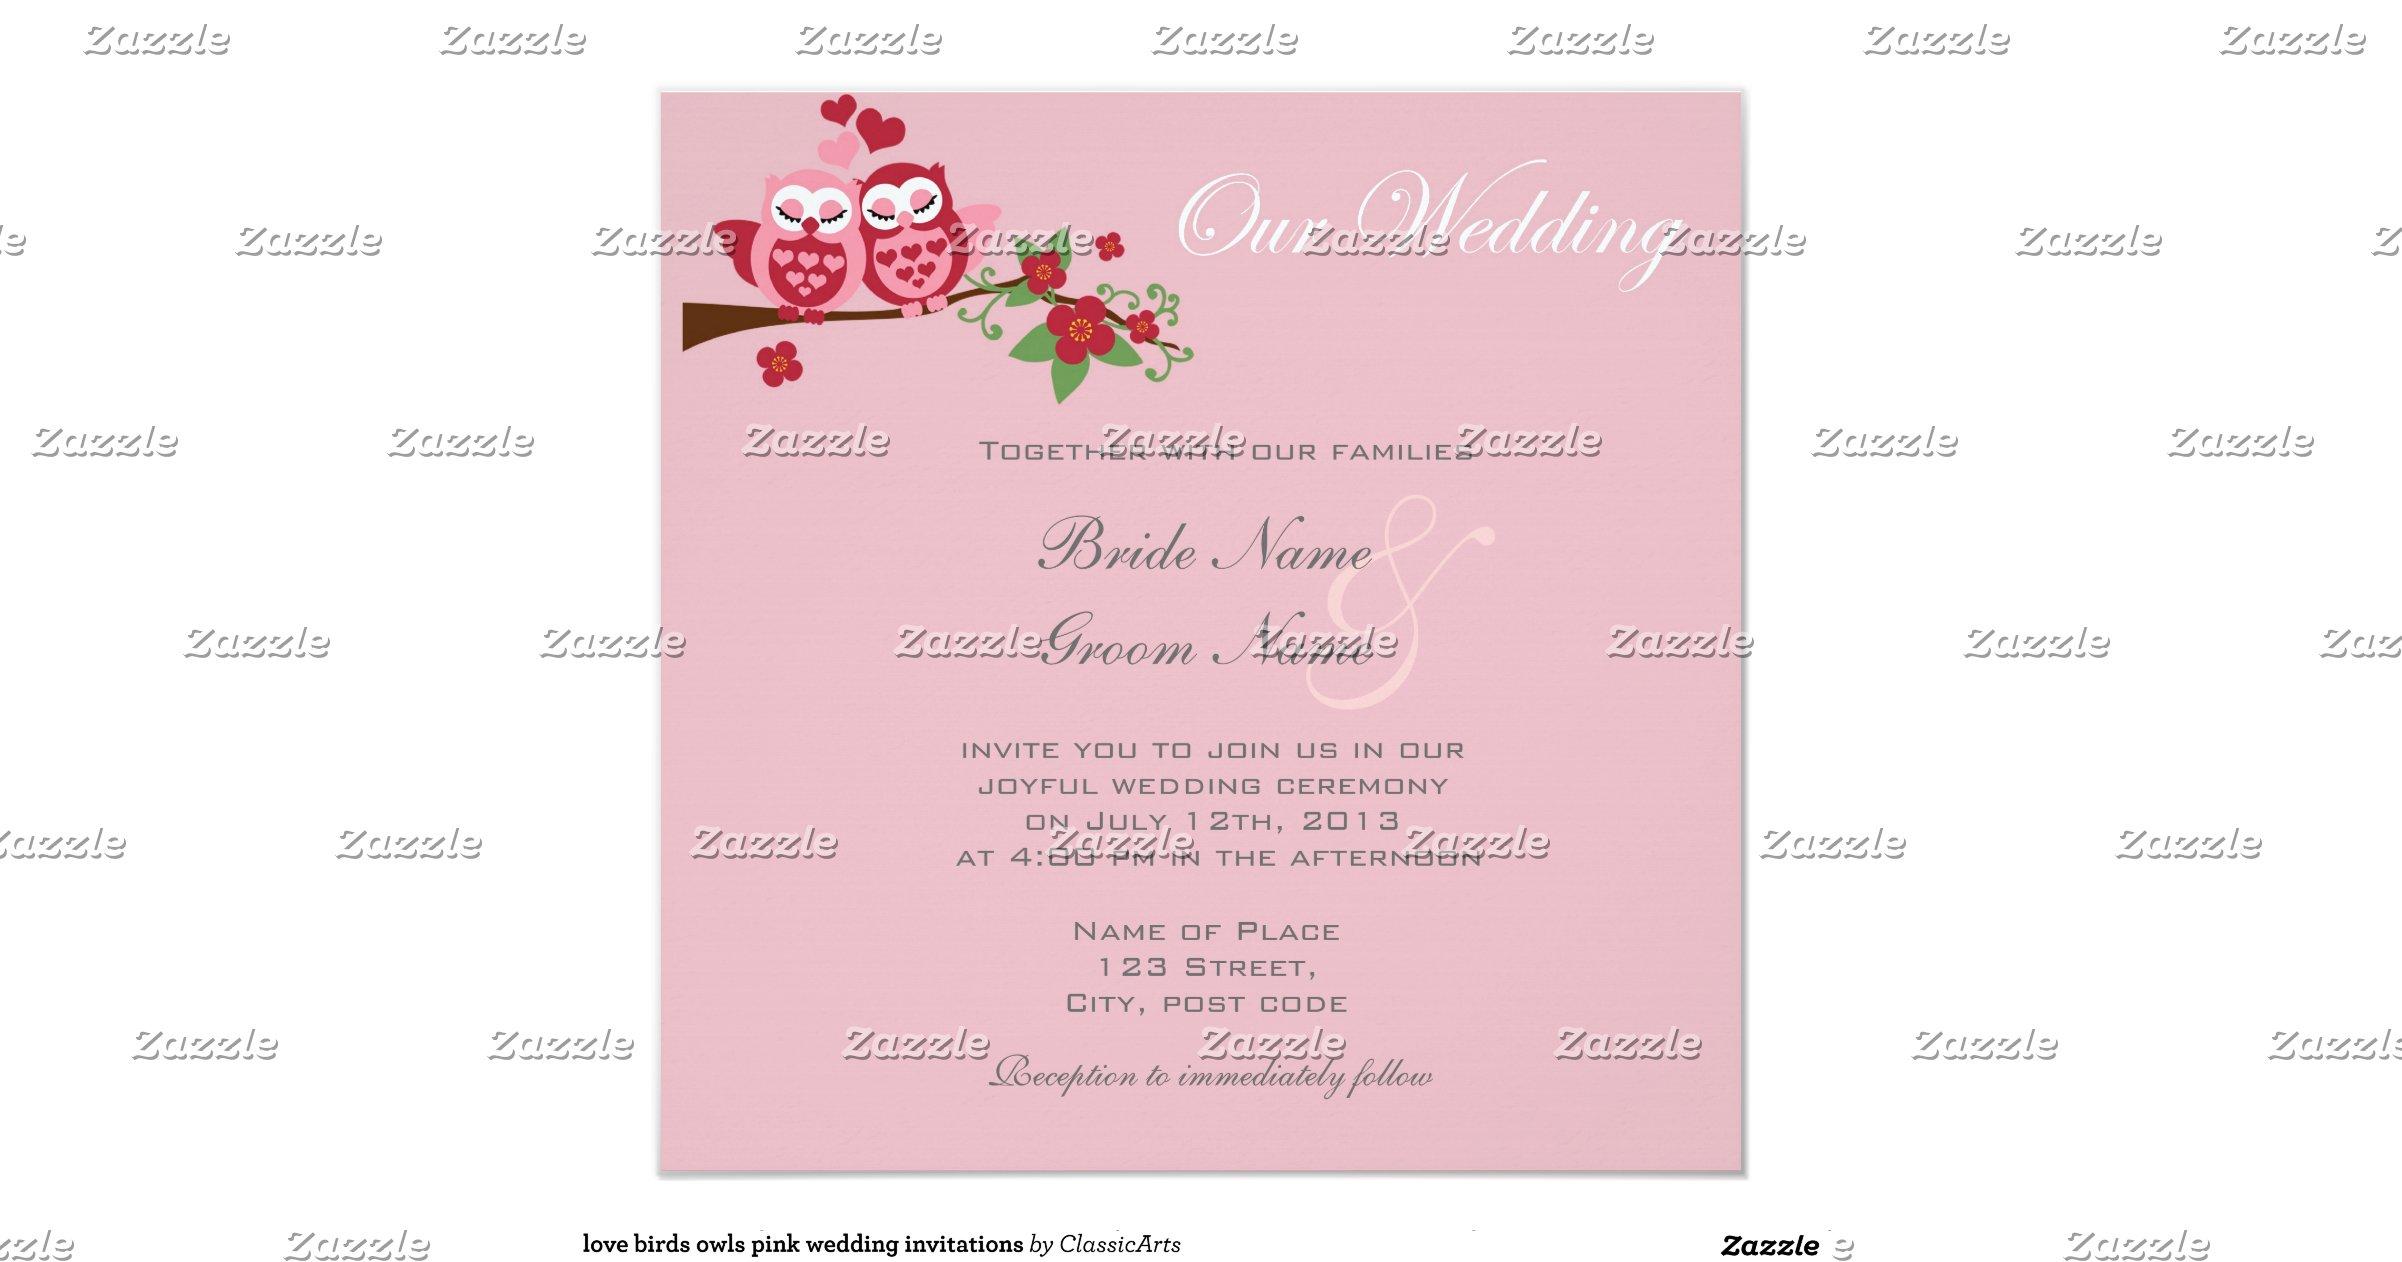 Love Birds Wedding Invitations: Love Birds Owls Pink Wedding Invitations